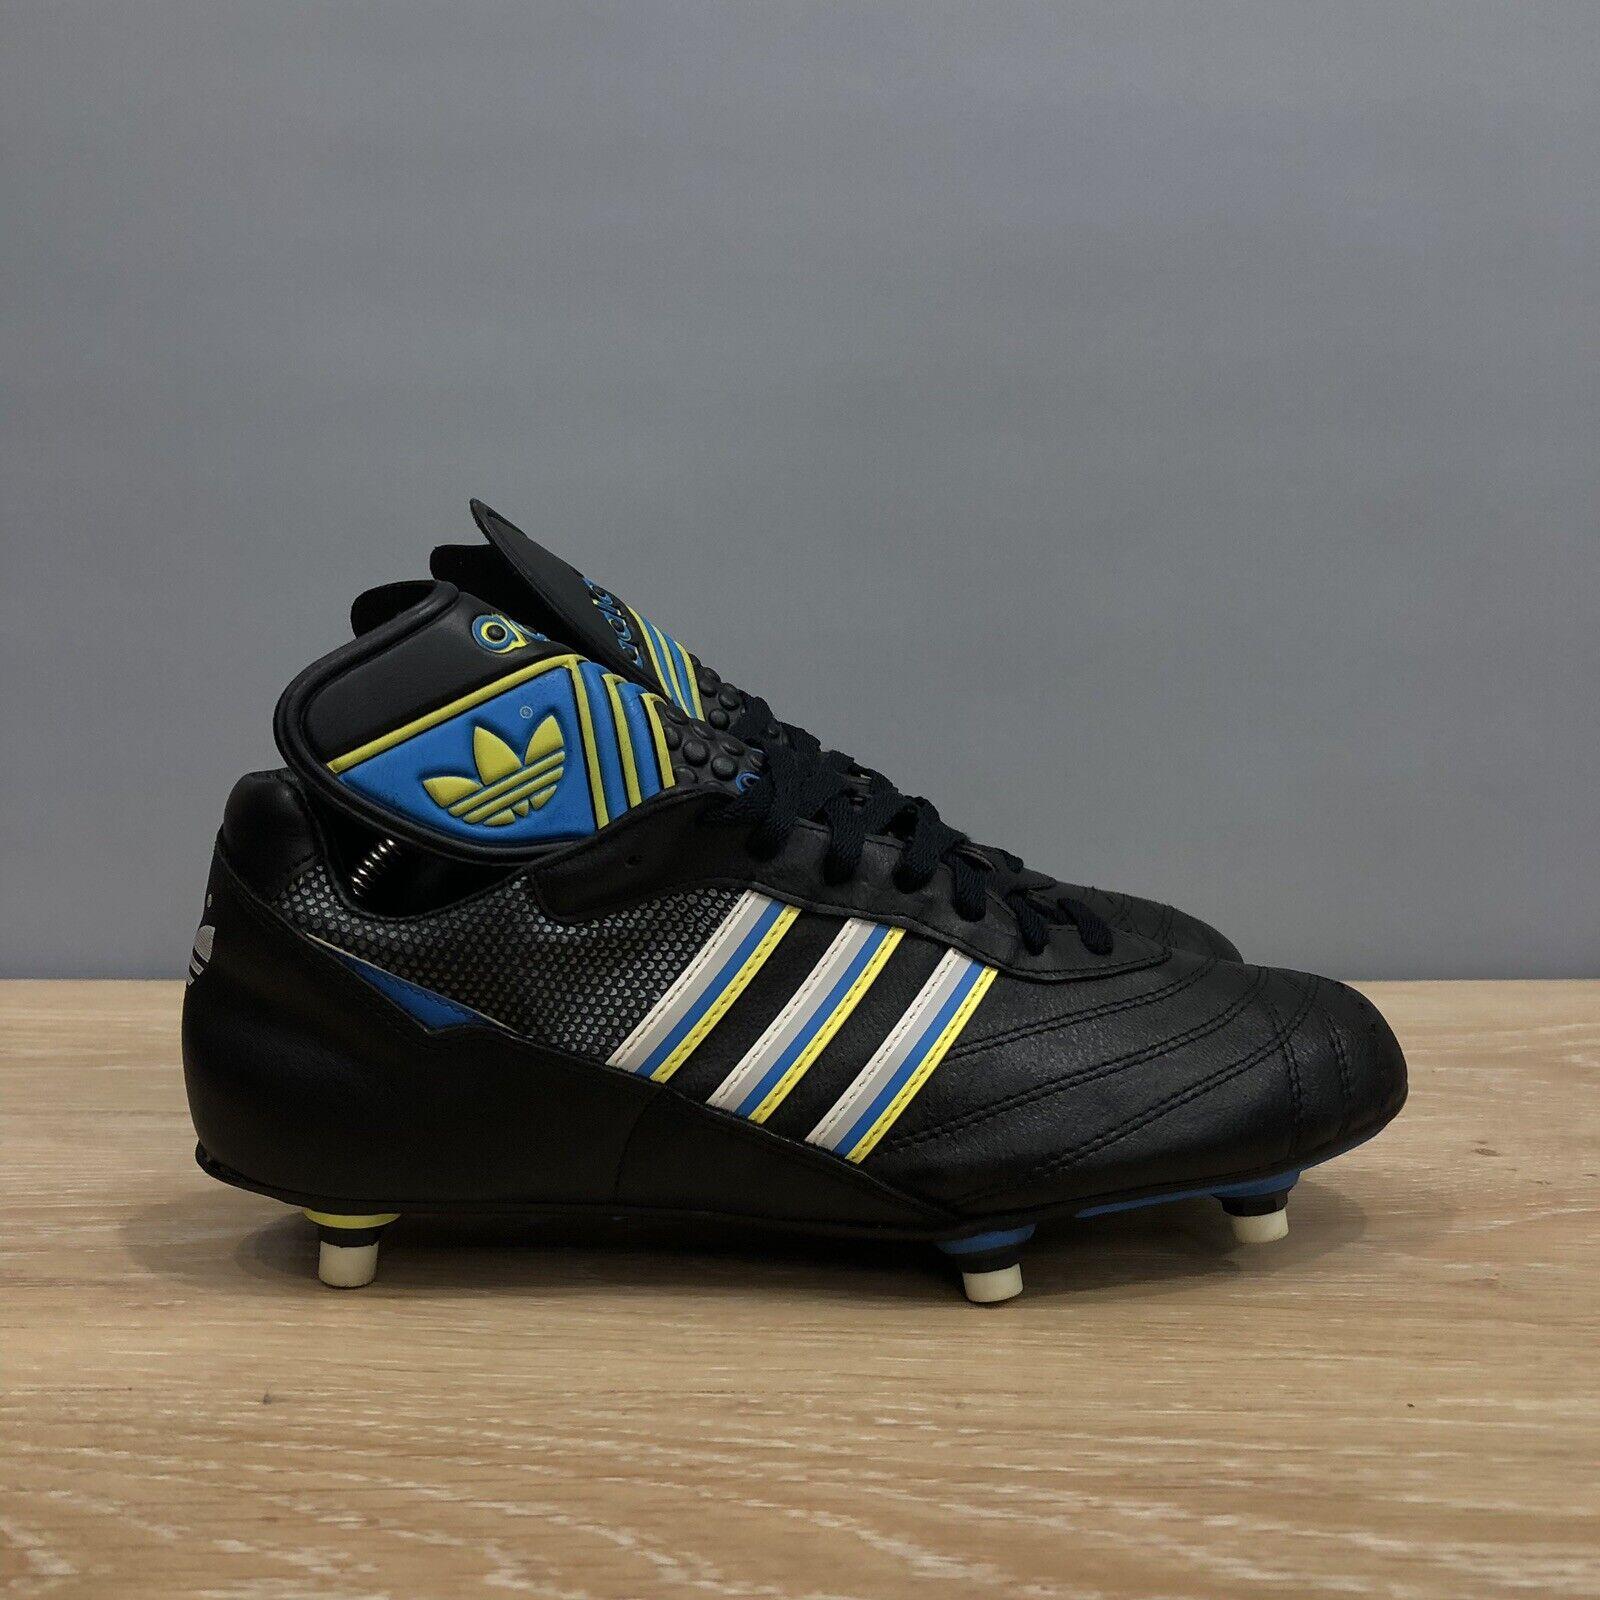 Rare Vintage Adidas Legend Football zapatos 90s Talla Us 10